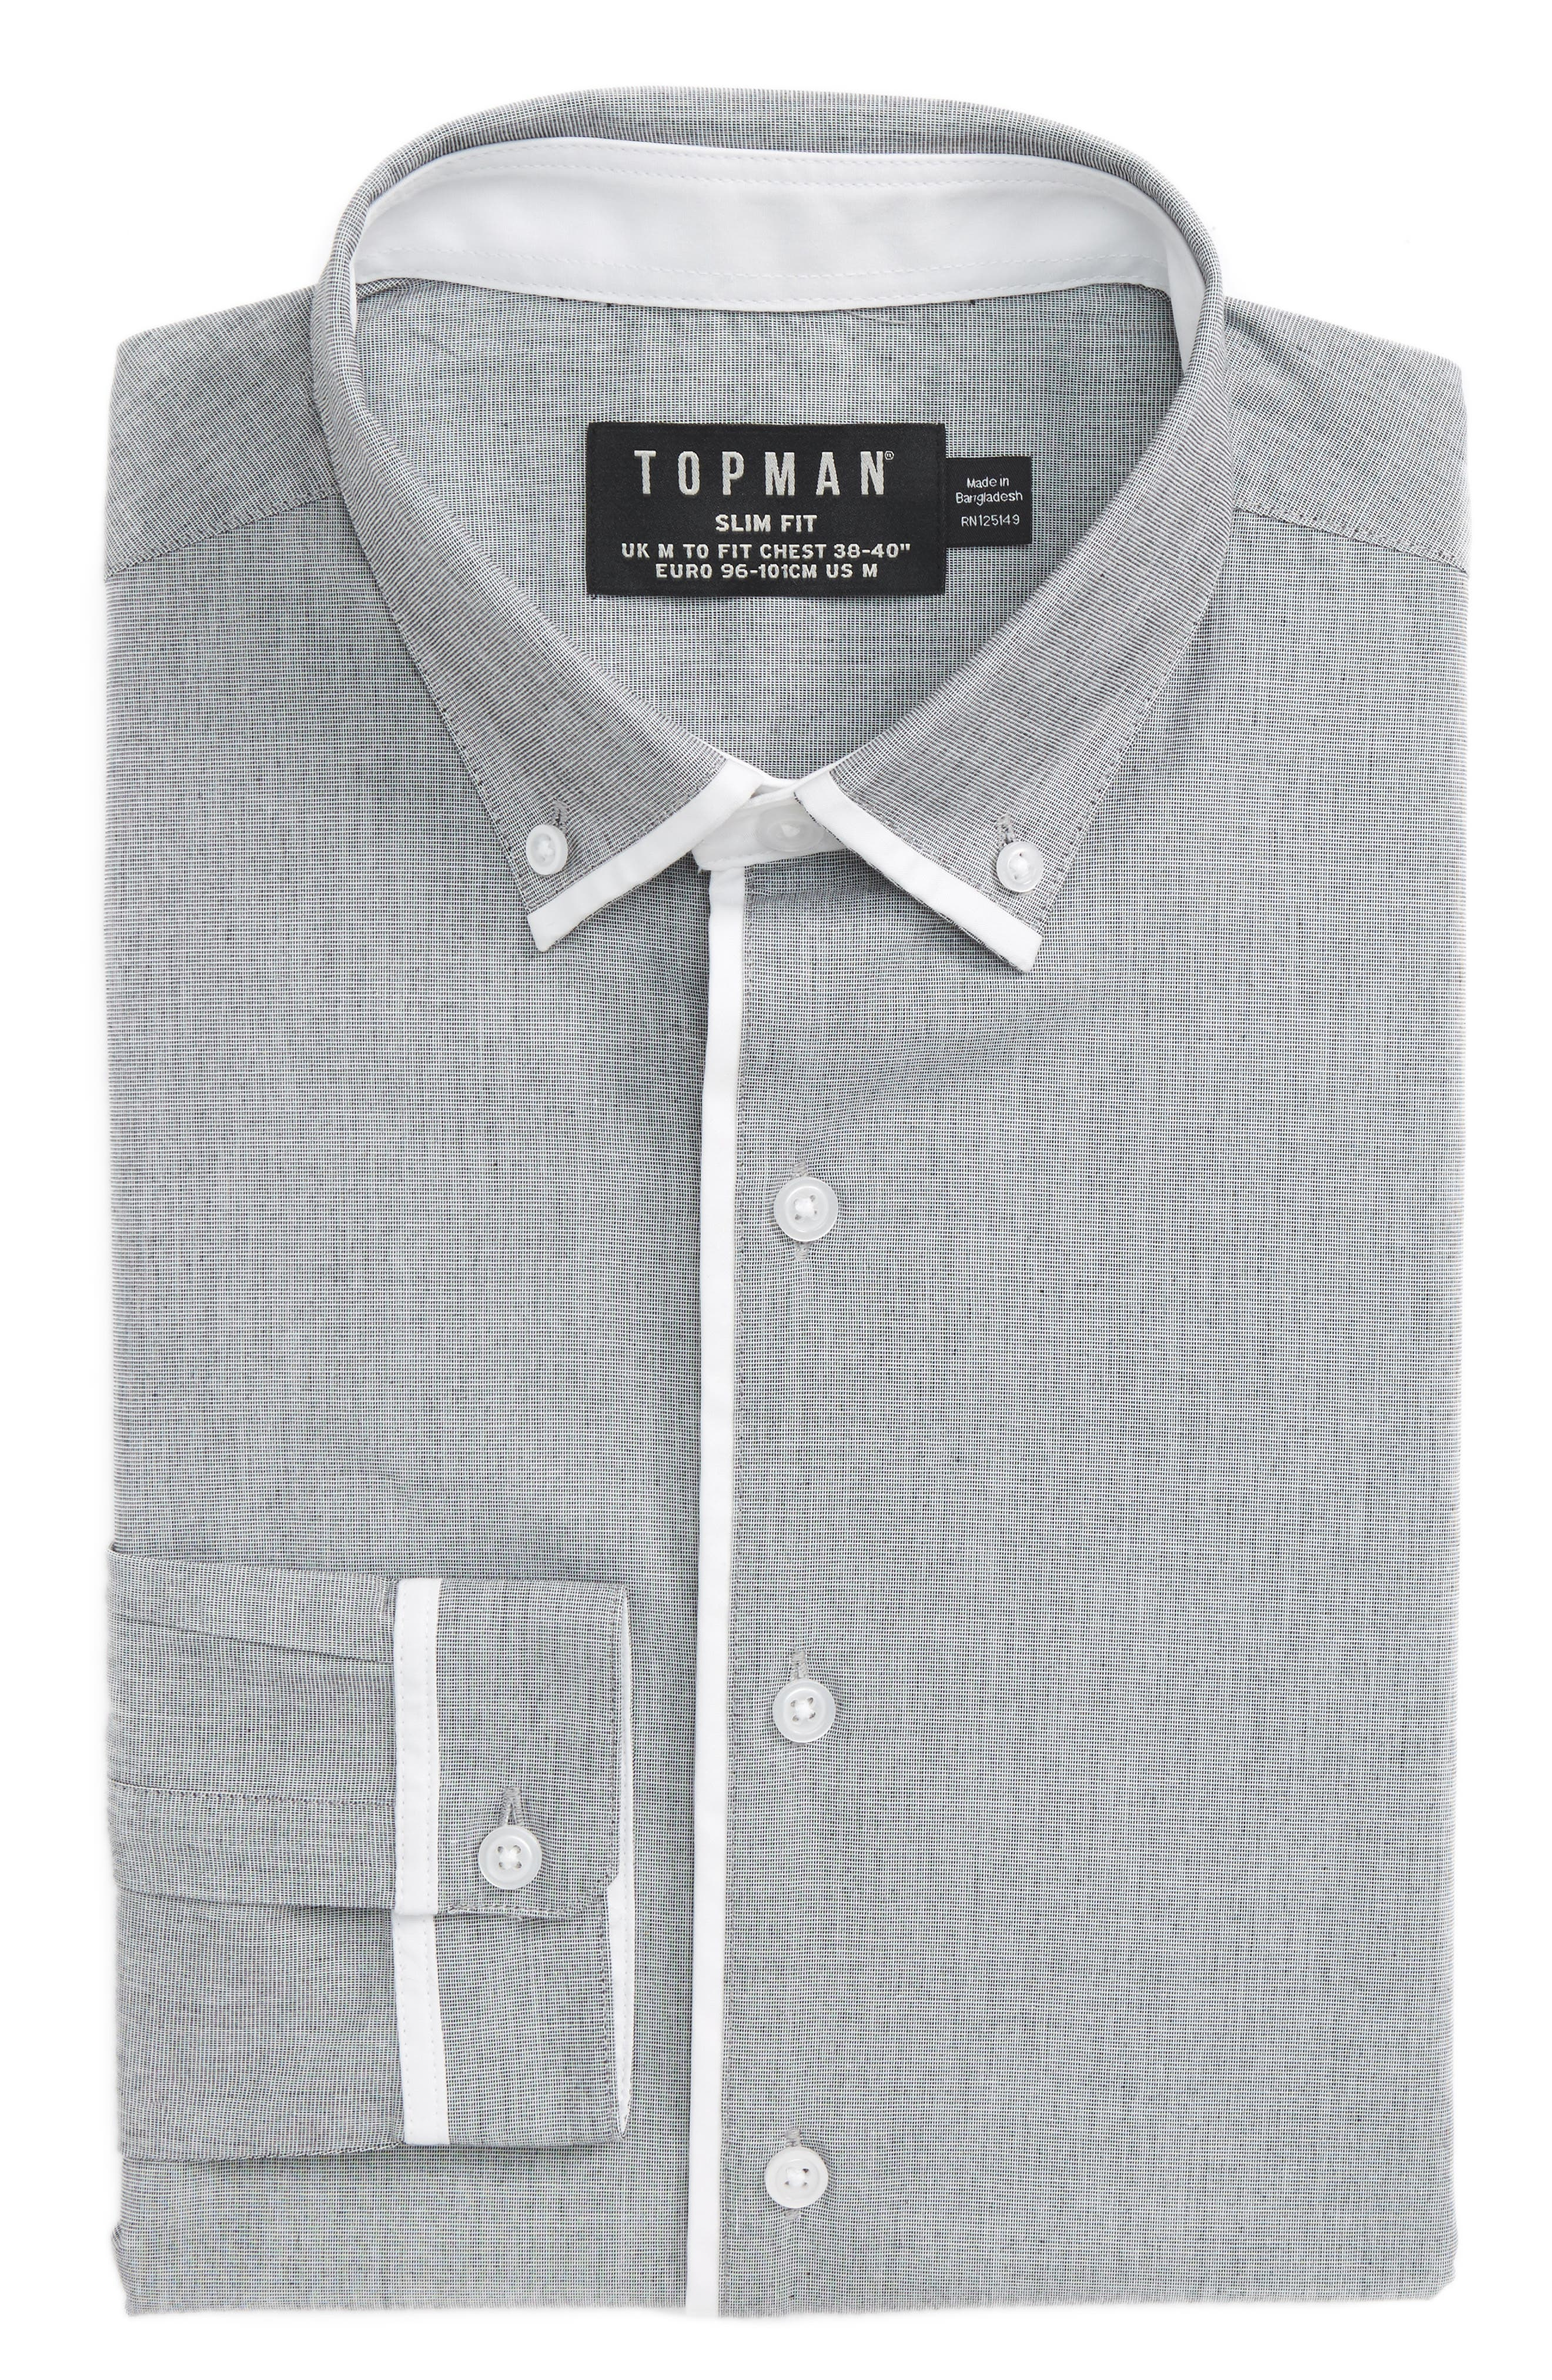 Leeson Slim Fit Smart Shirt,                             Alternate thumbnail 4, color,                             020